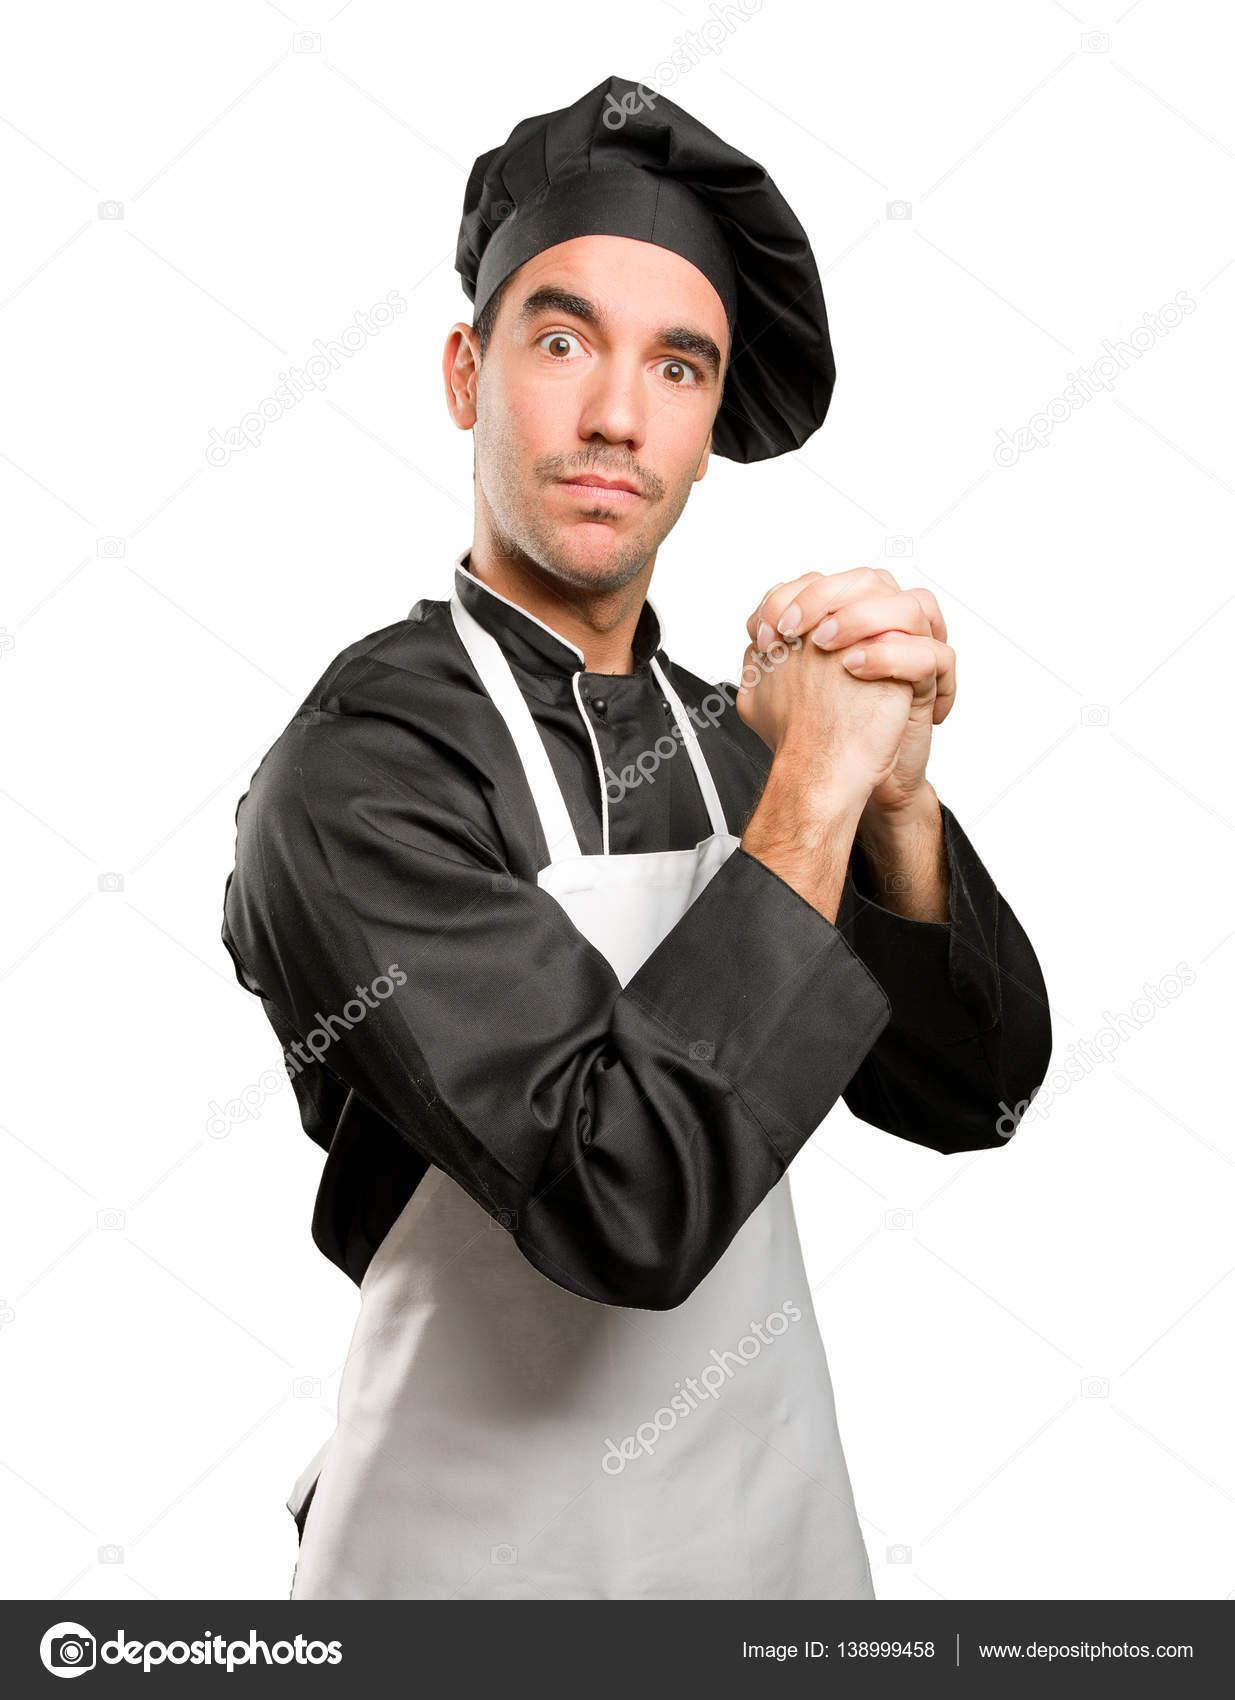 Seznamka pro kuchaře